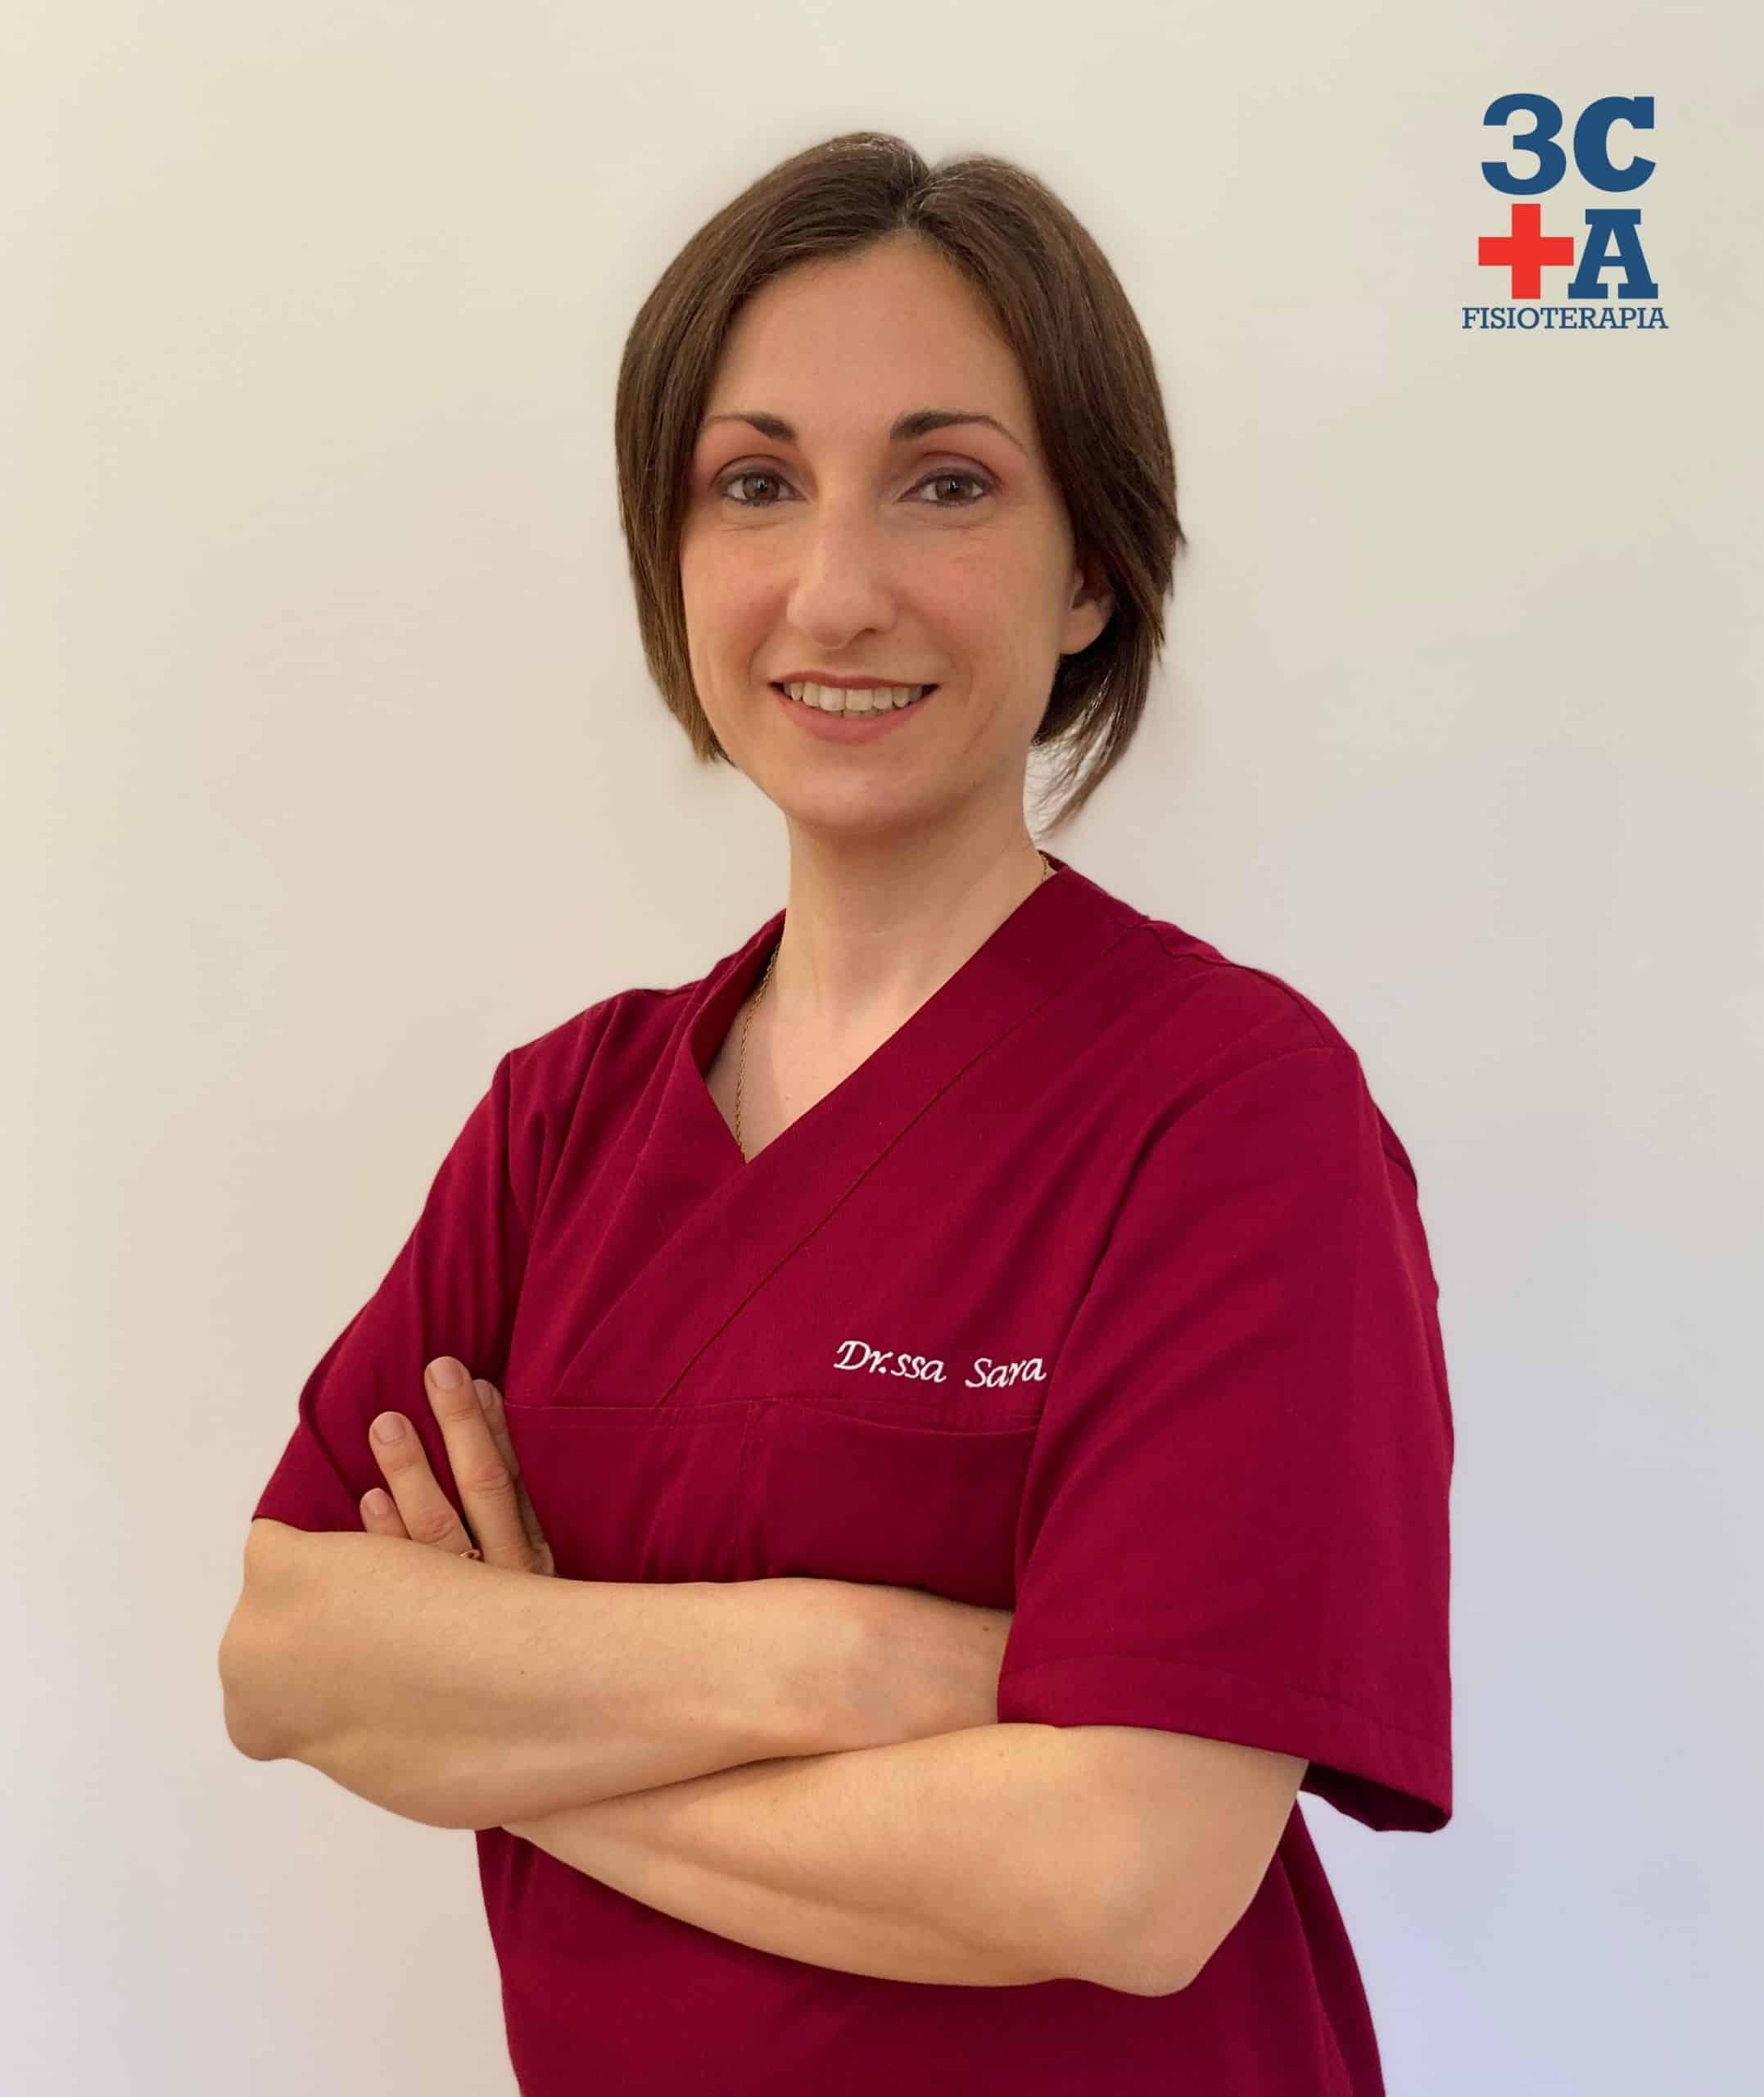 Staff 3C+A Dr.ssa Sara 071